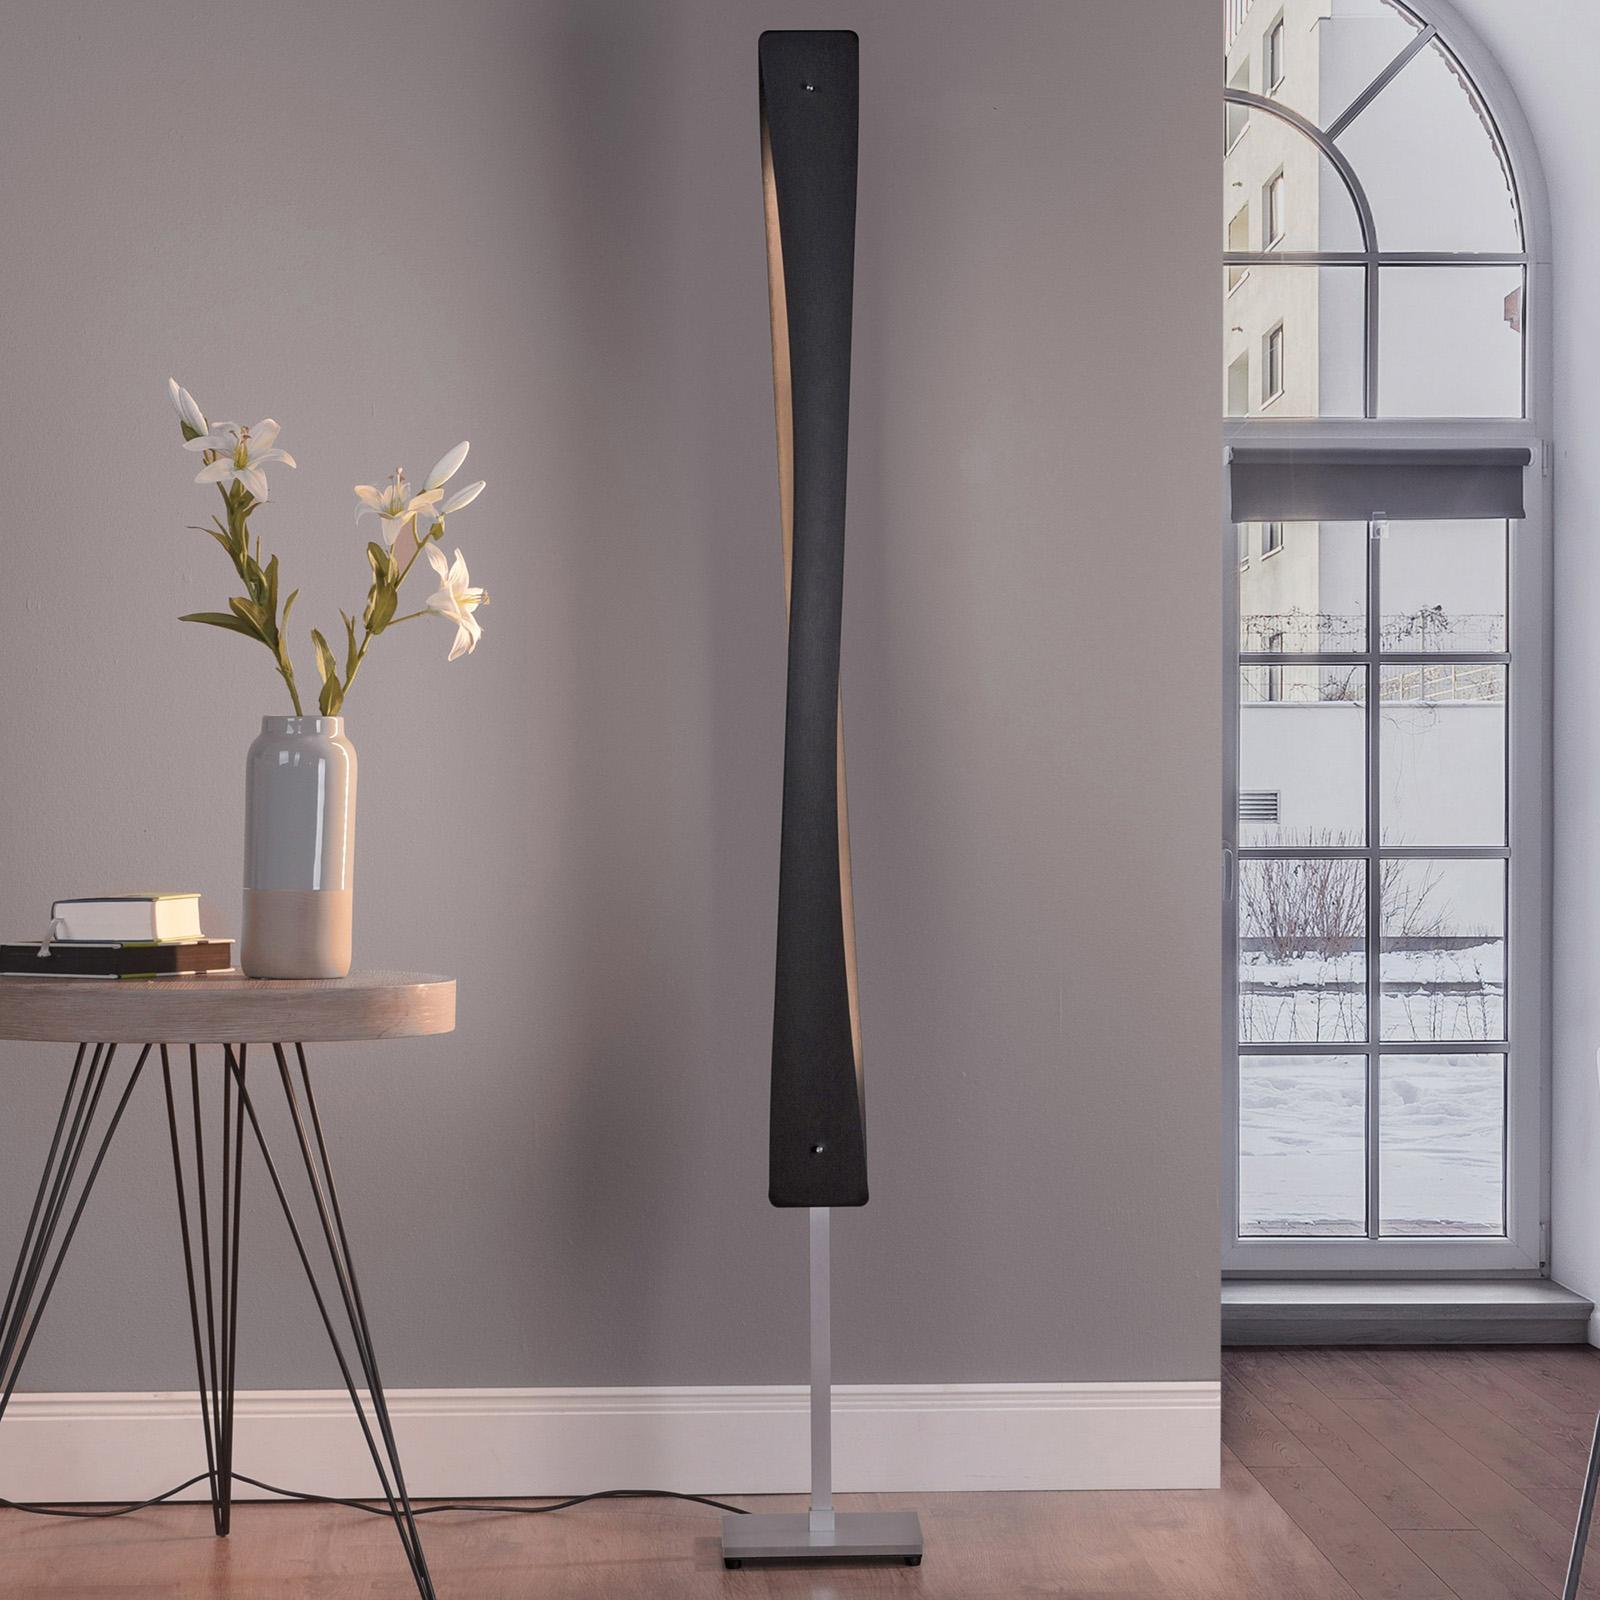 Lucande Lian LED-Stehleuchte, schwarz, alu